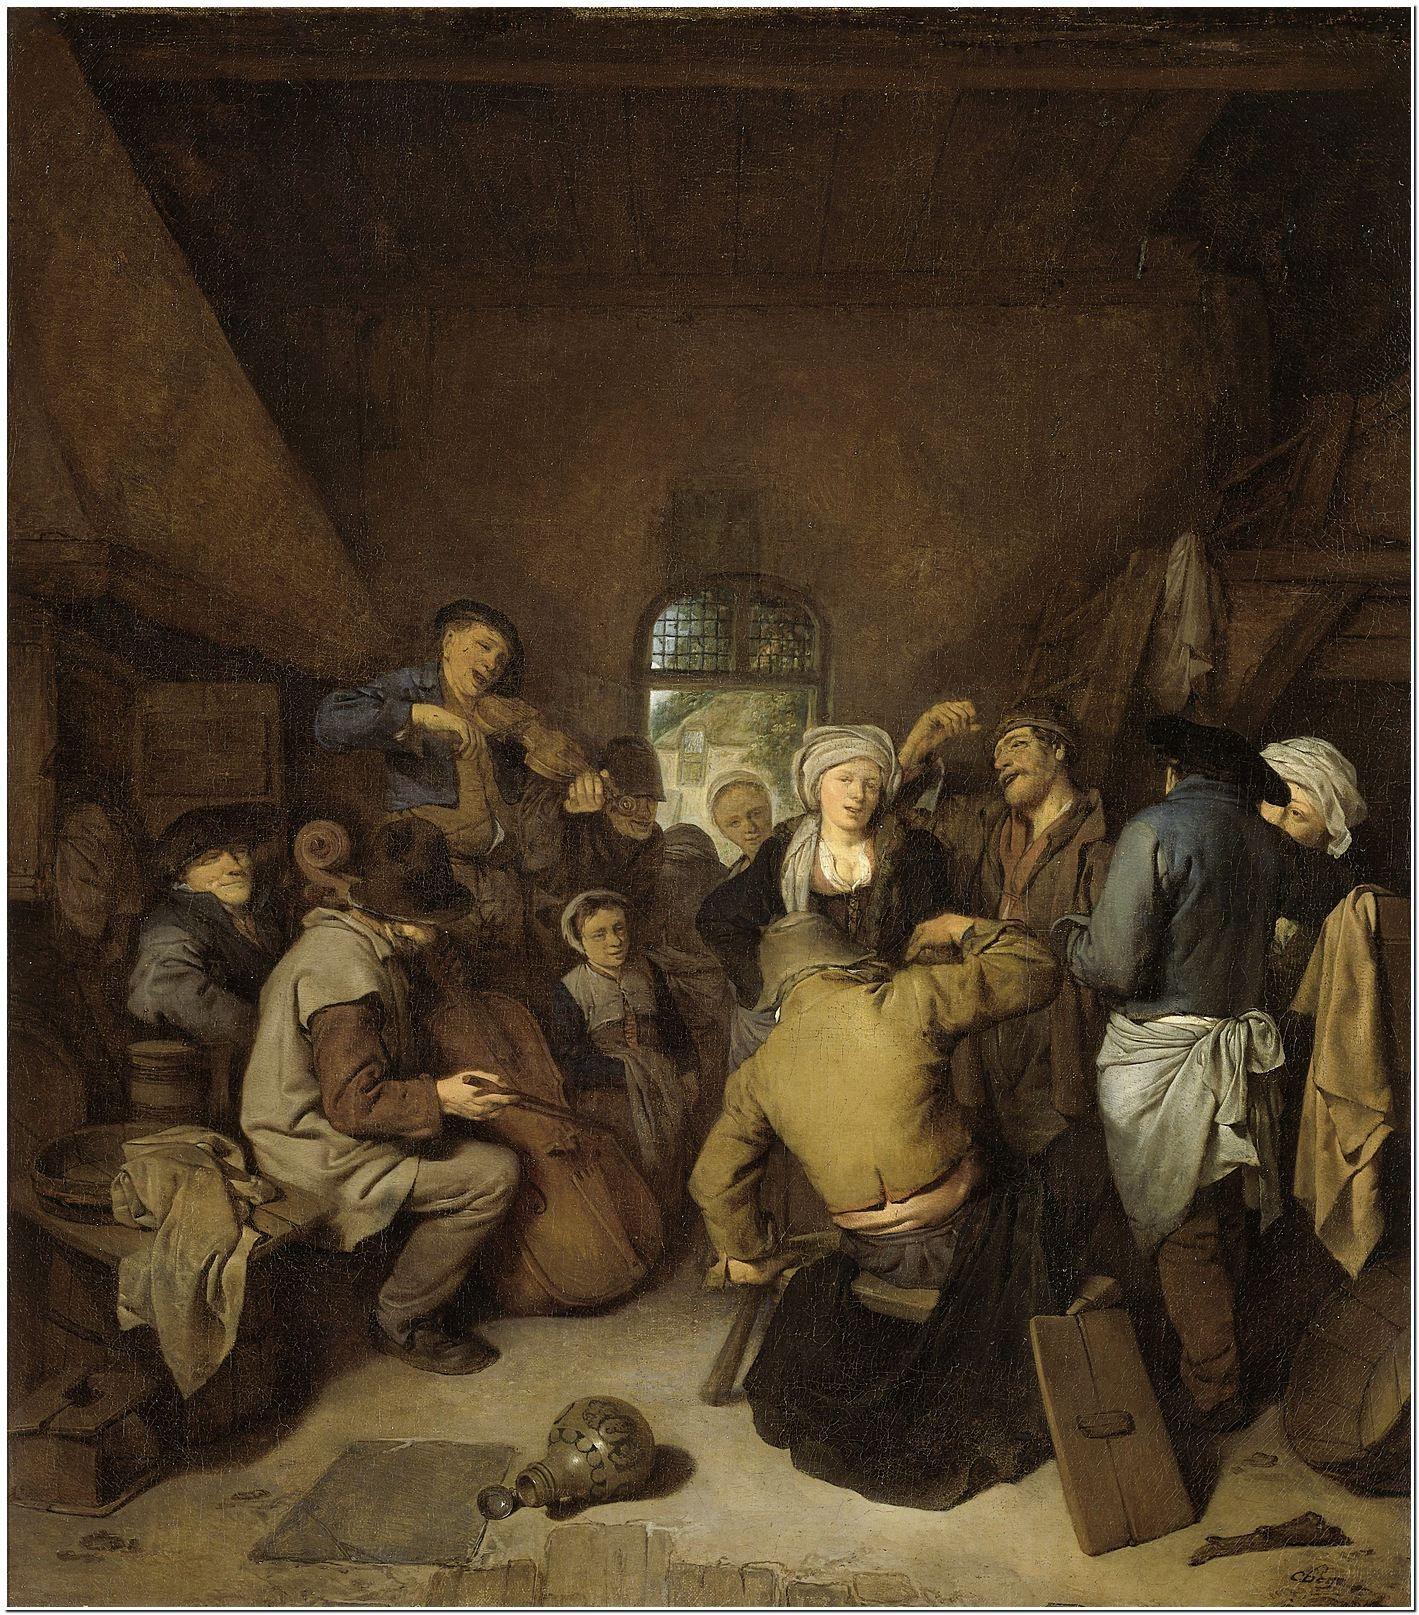 Music-making and Dancing Peasants (A Musical Entertainment), Cornelis Pietersz. Bega, 1650 - 1664